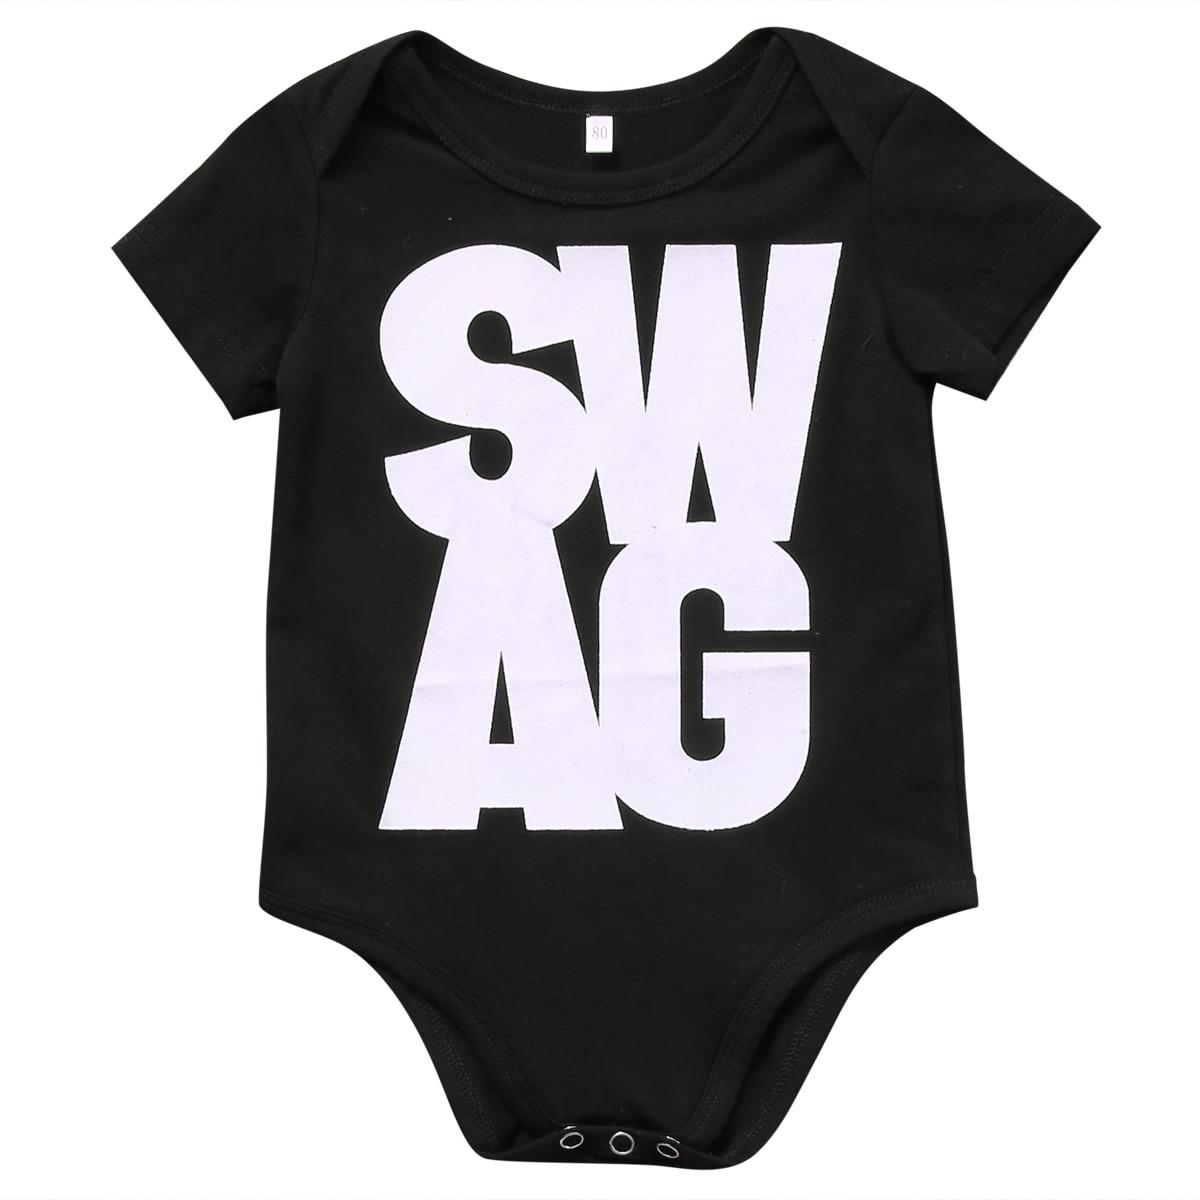 Newborn Kids Baby Boy Girl Unisex SWAG Bodysuit Jumpsuit Sunsuit Outfit Clothes Casual Babies Short Sleeve Bodysuits